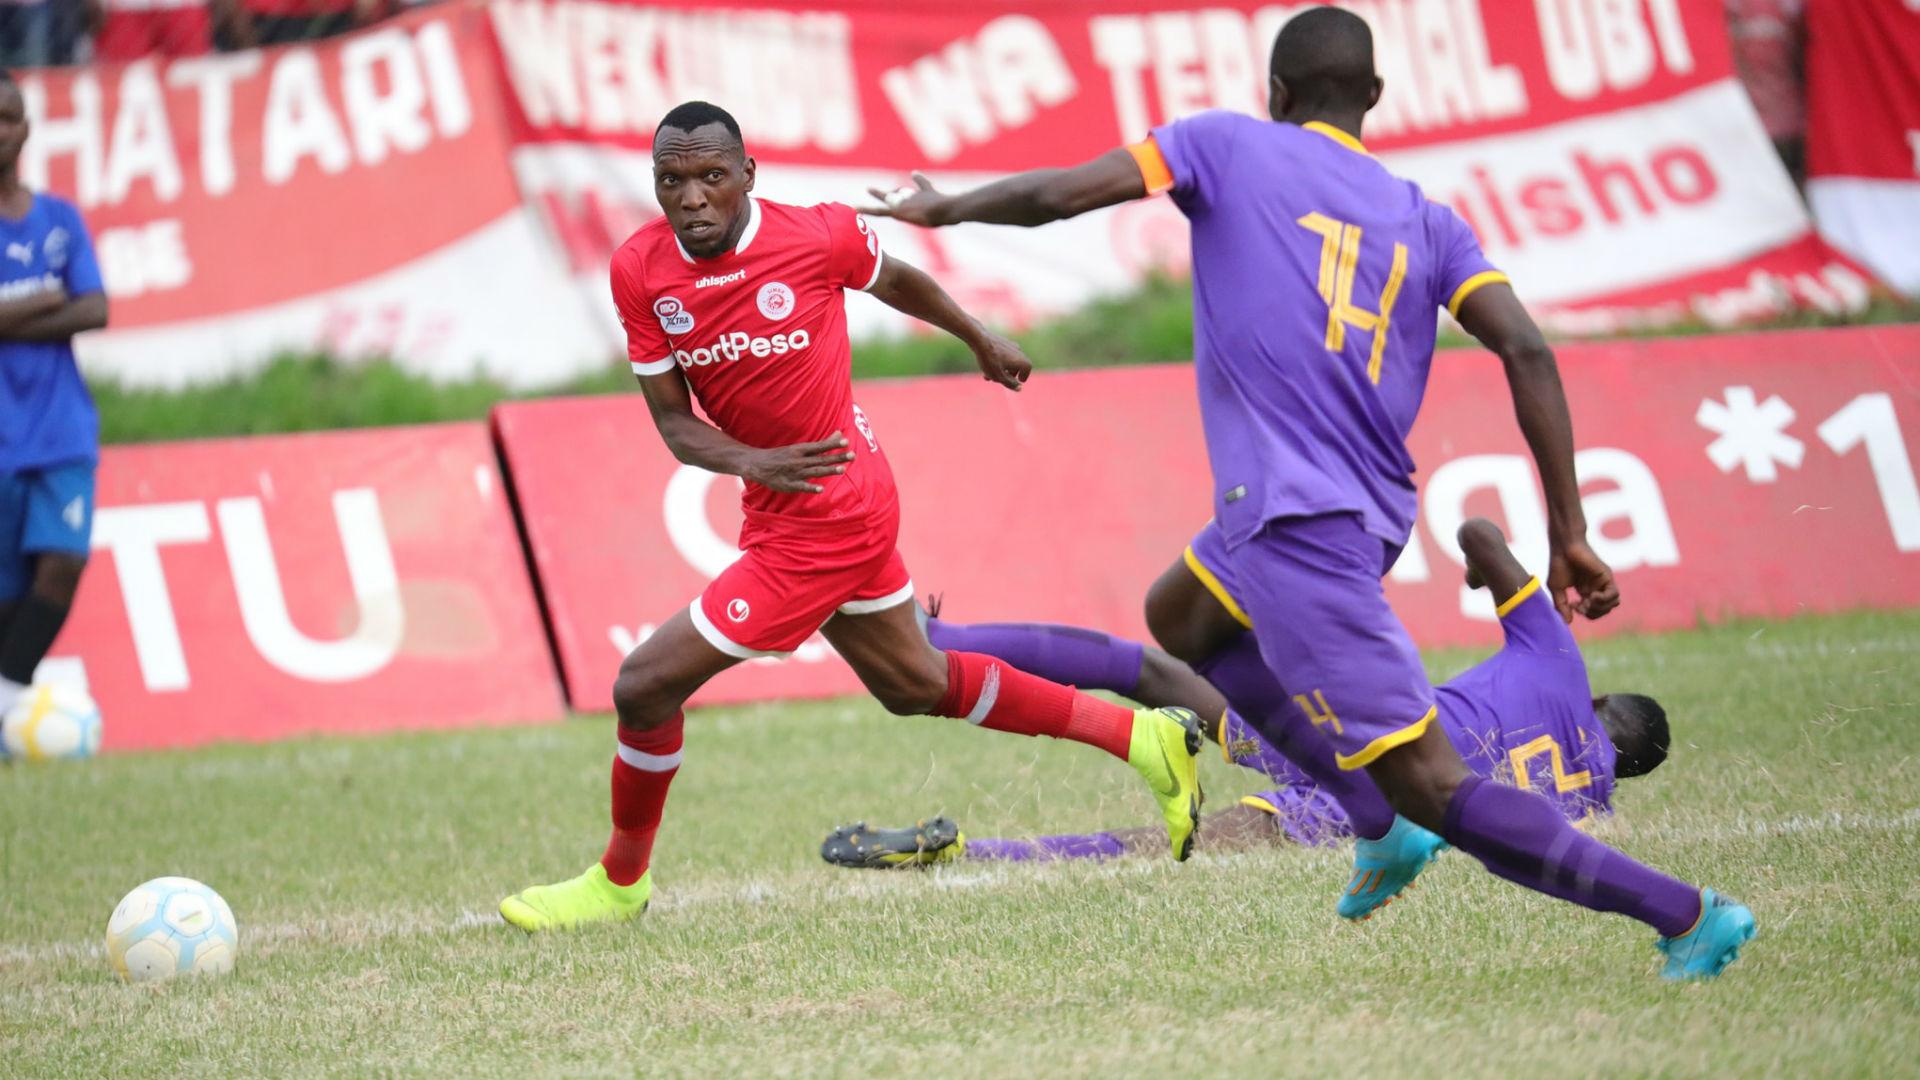 Happy Vandenbroeck knew Mbeya City will trouble champions Simba SC